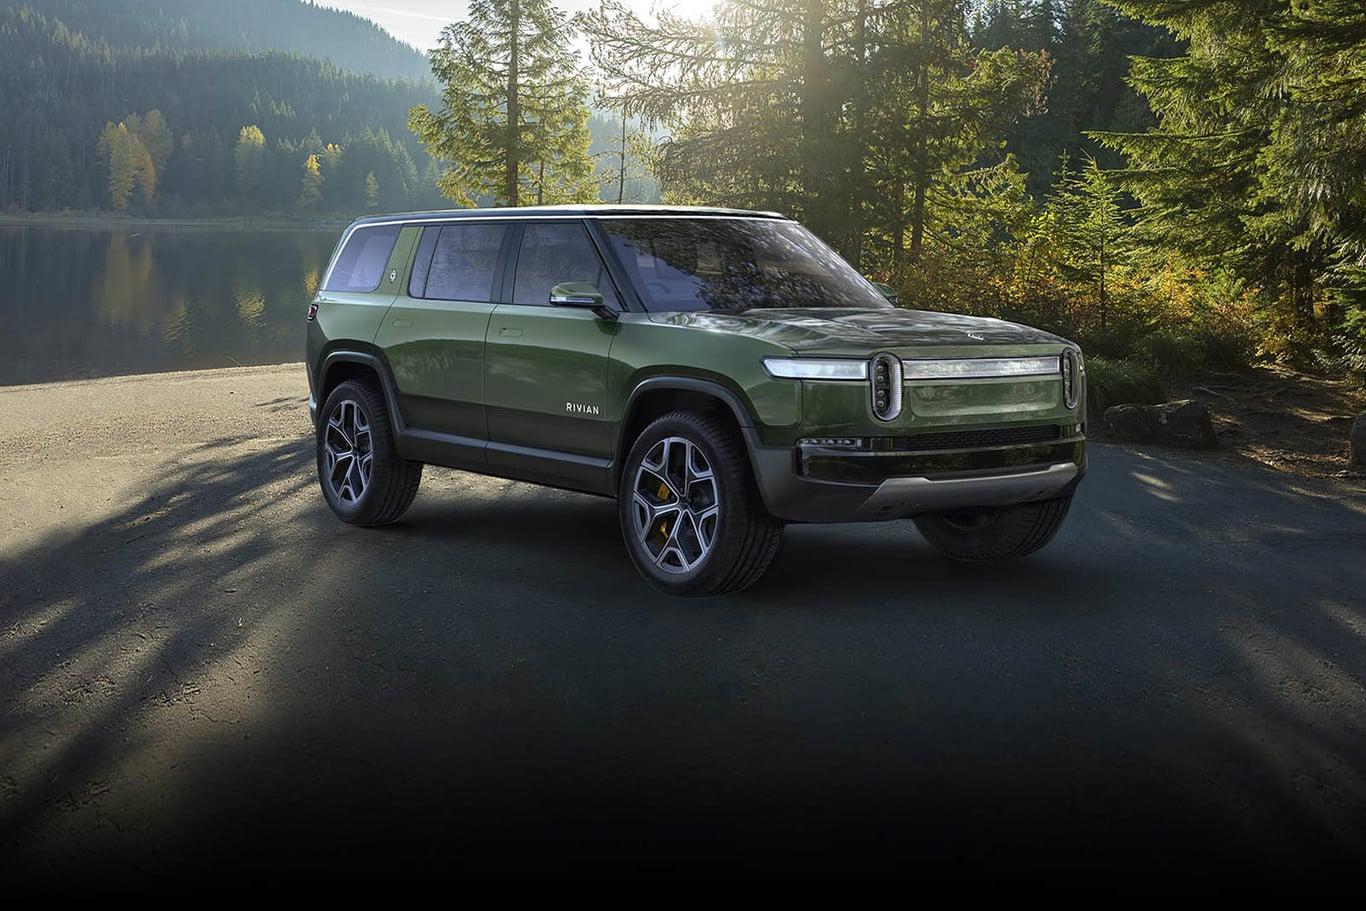 Www Punjabjobalert Com2019 Hd Picks: Rivian R1S SUV 2020: Un Prometedor SUV Eléctrico De Casi